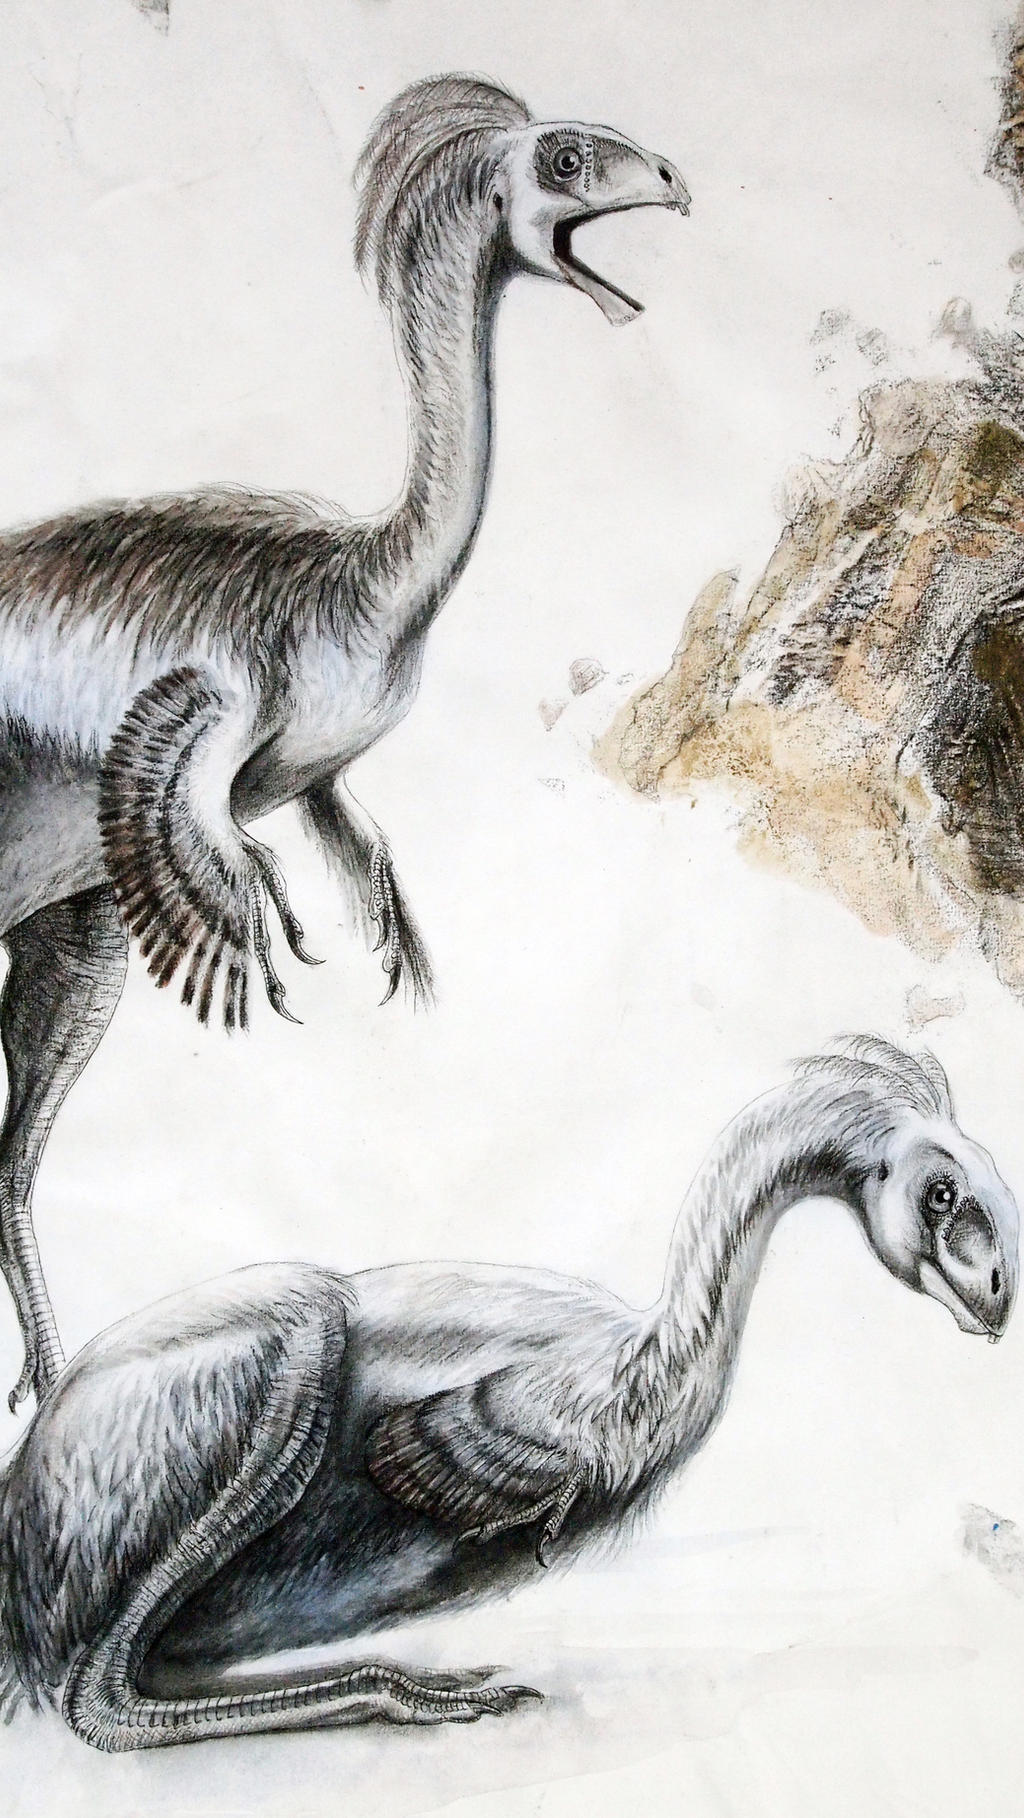 Jehol Biota--Incisivosaurus gauthieri--Close-up